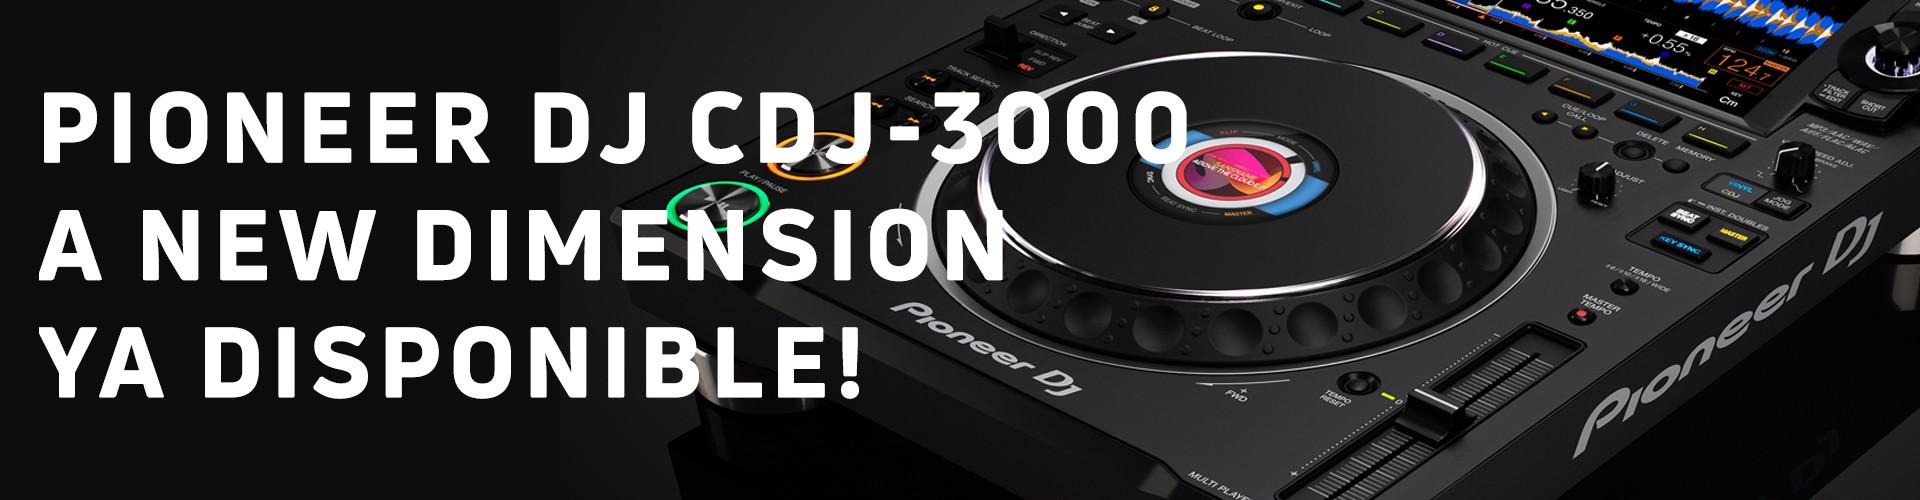 Pioneer DJ CDJ-3000 Ya disponible